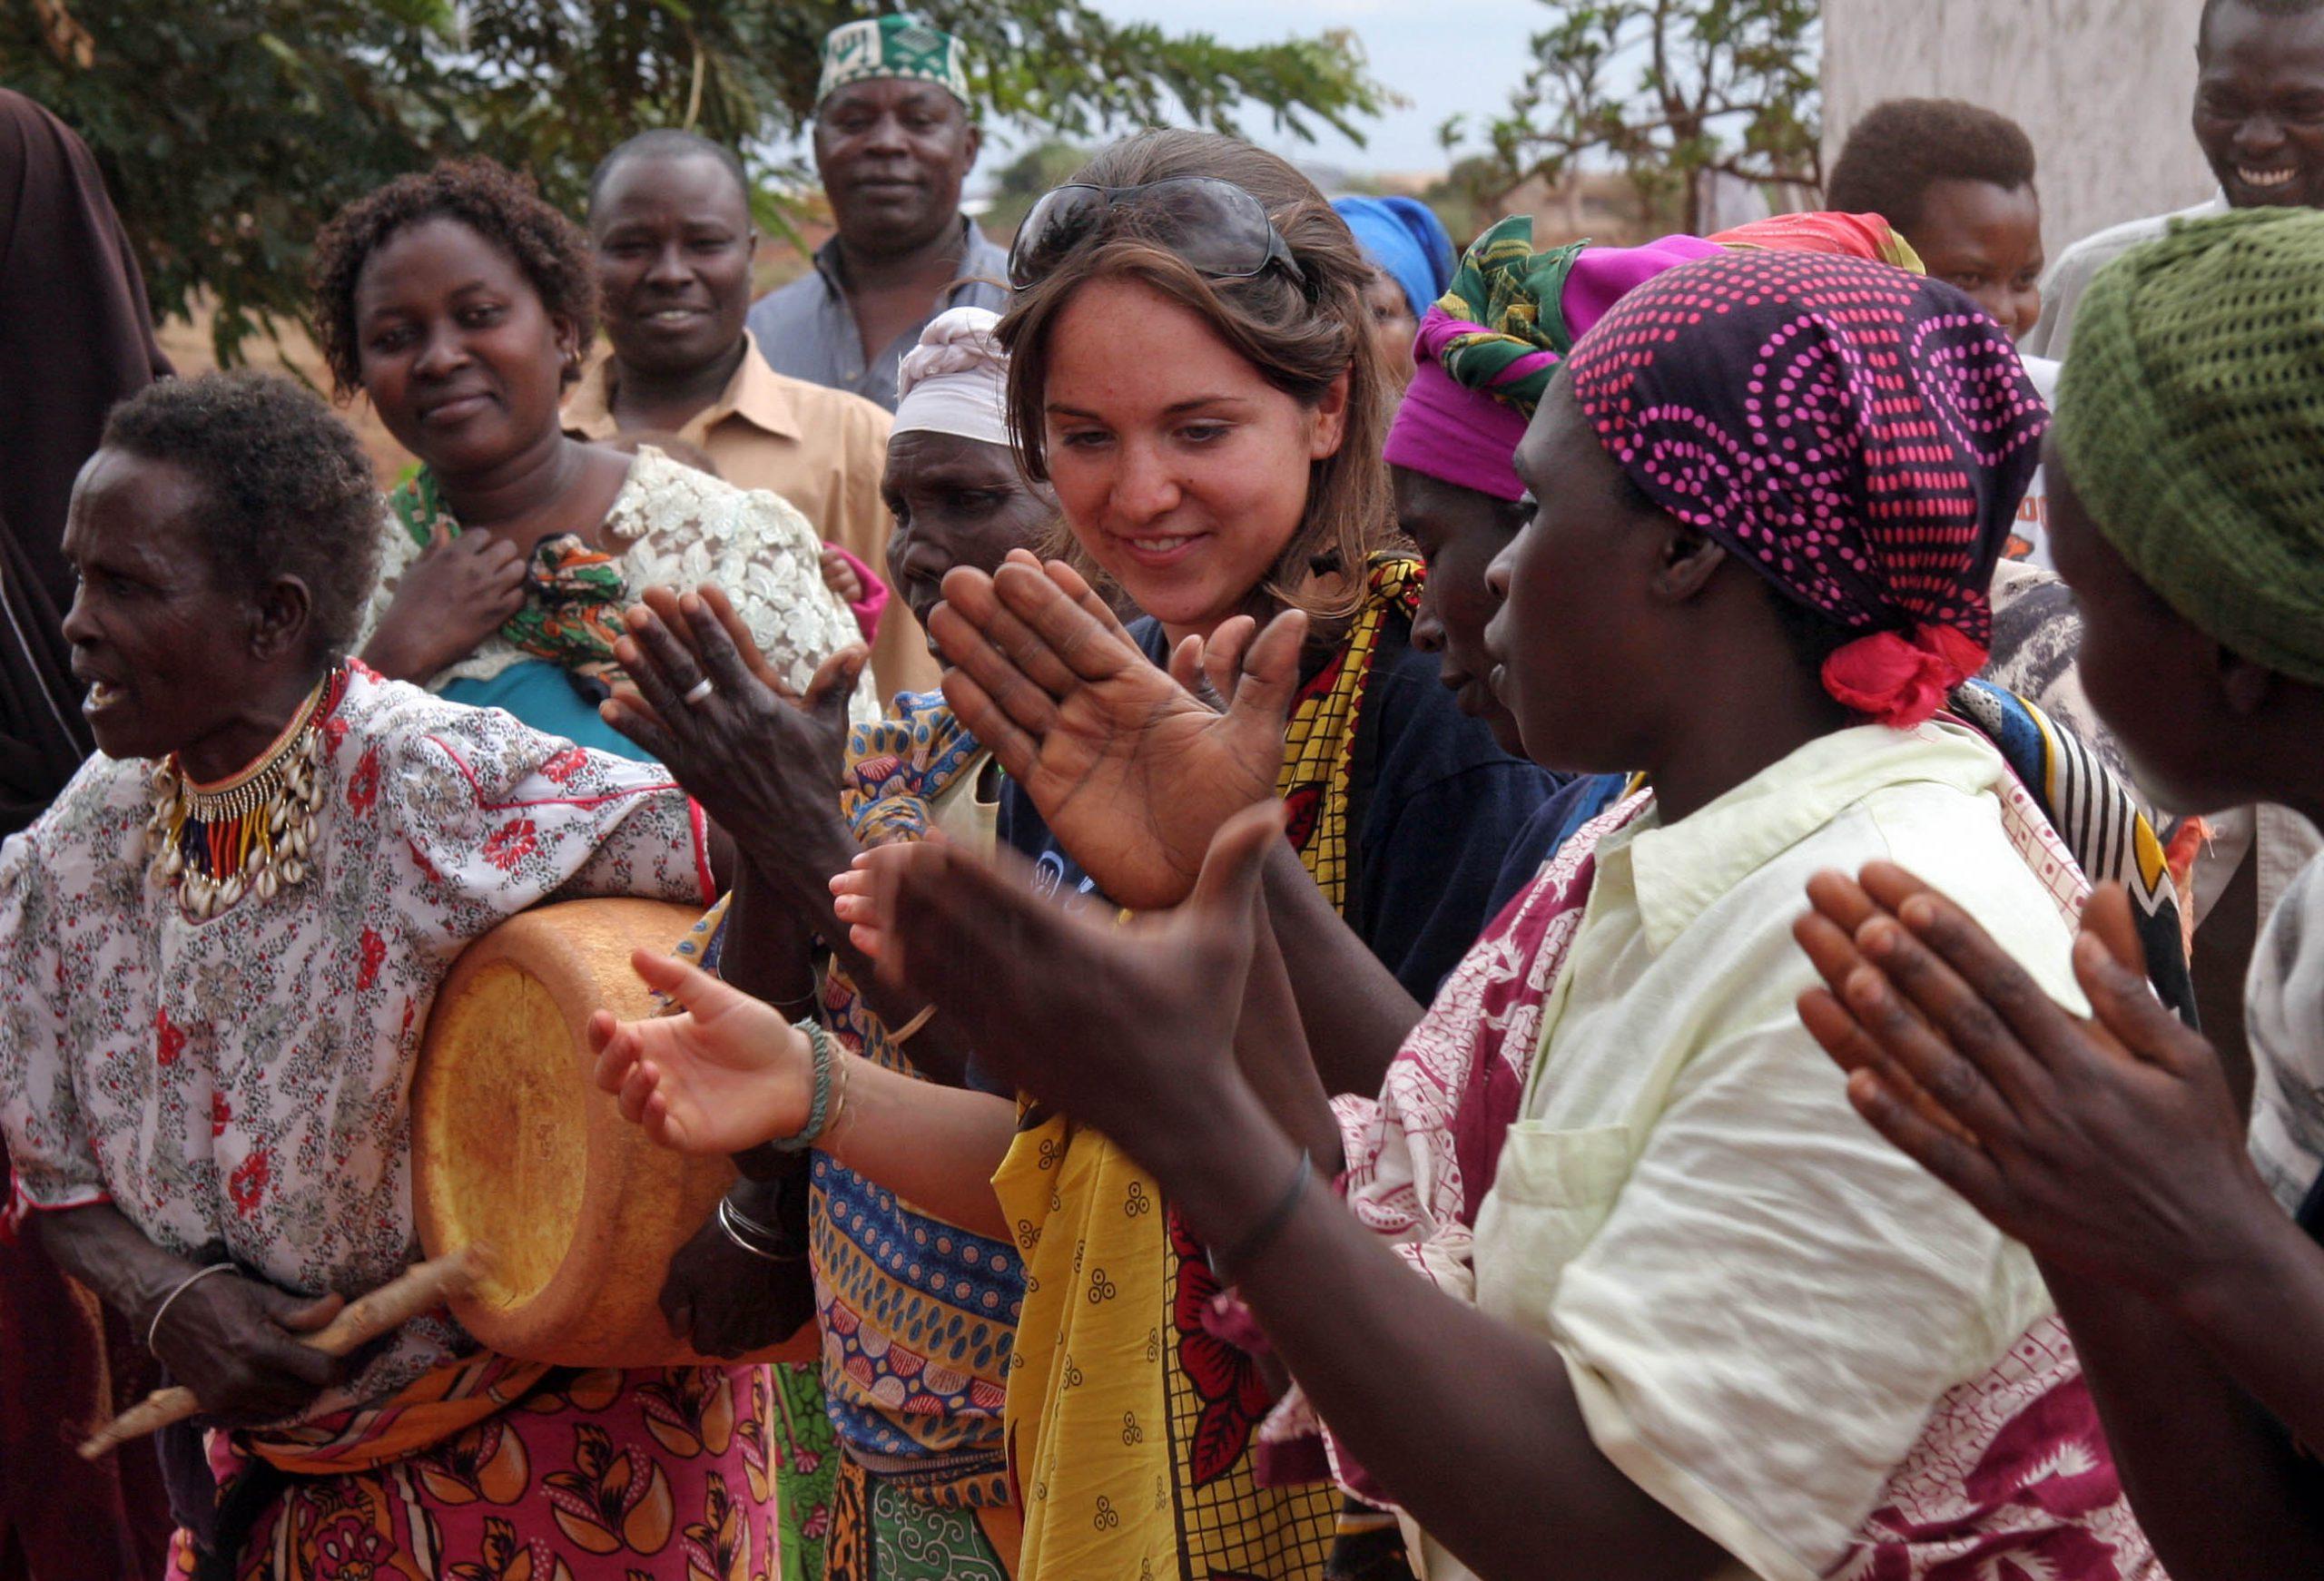 school_expedition_kenya_trek_traditional_music-1